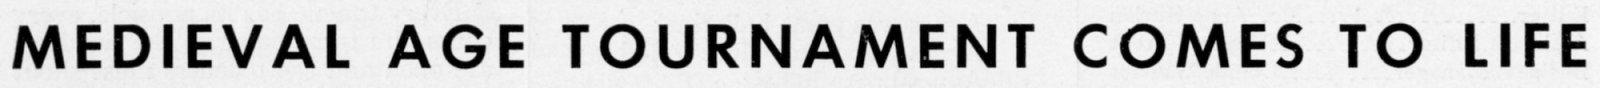 1959 Apr Match Vol XIV No 4 001 May Day Detail 002